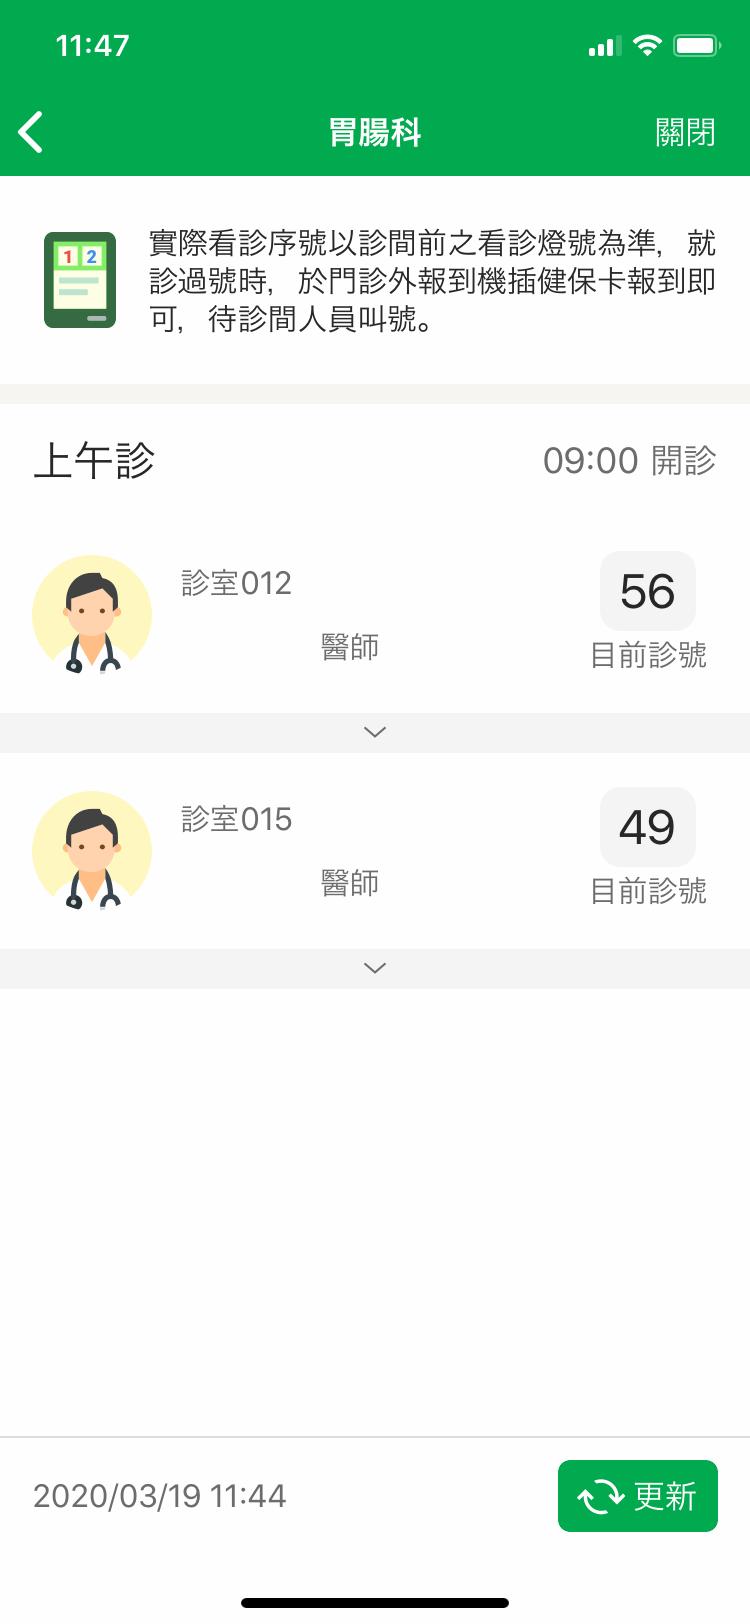 台北・國泰綜合醫院アプリの門診進度画面